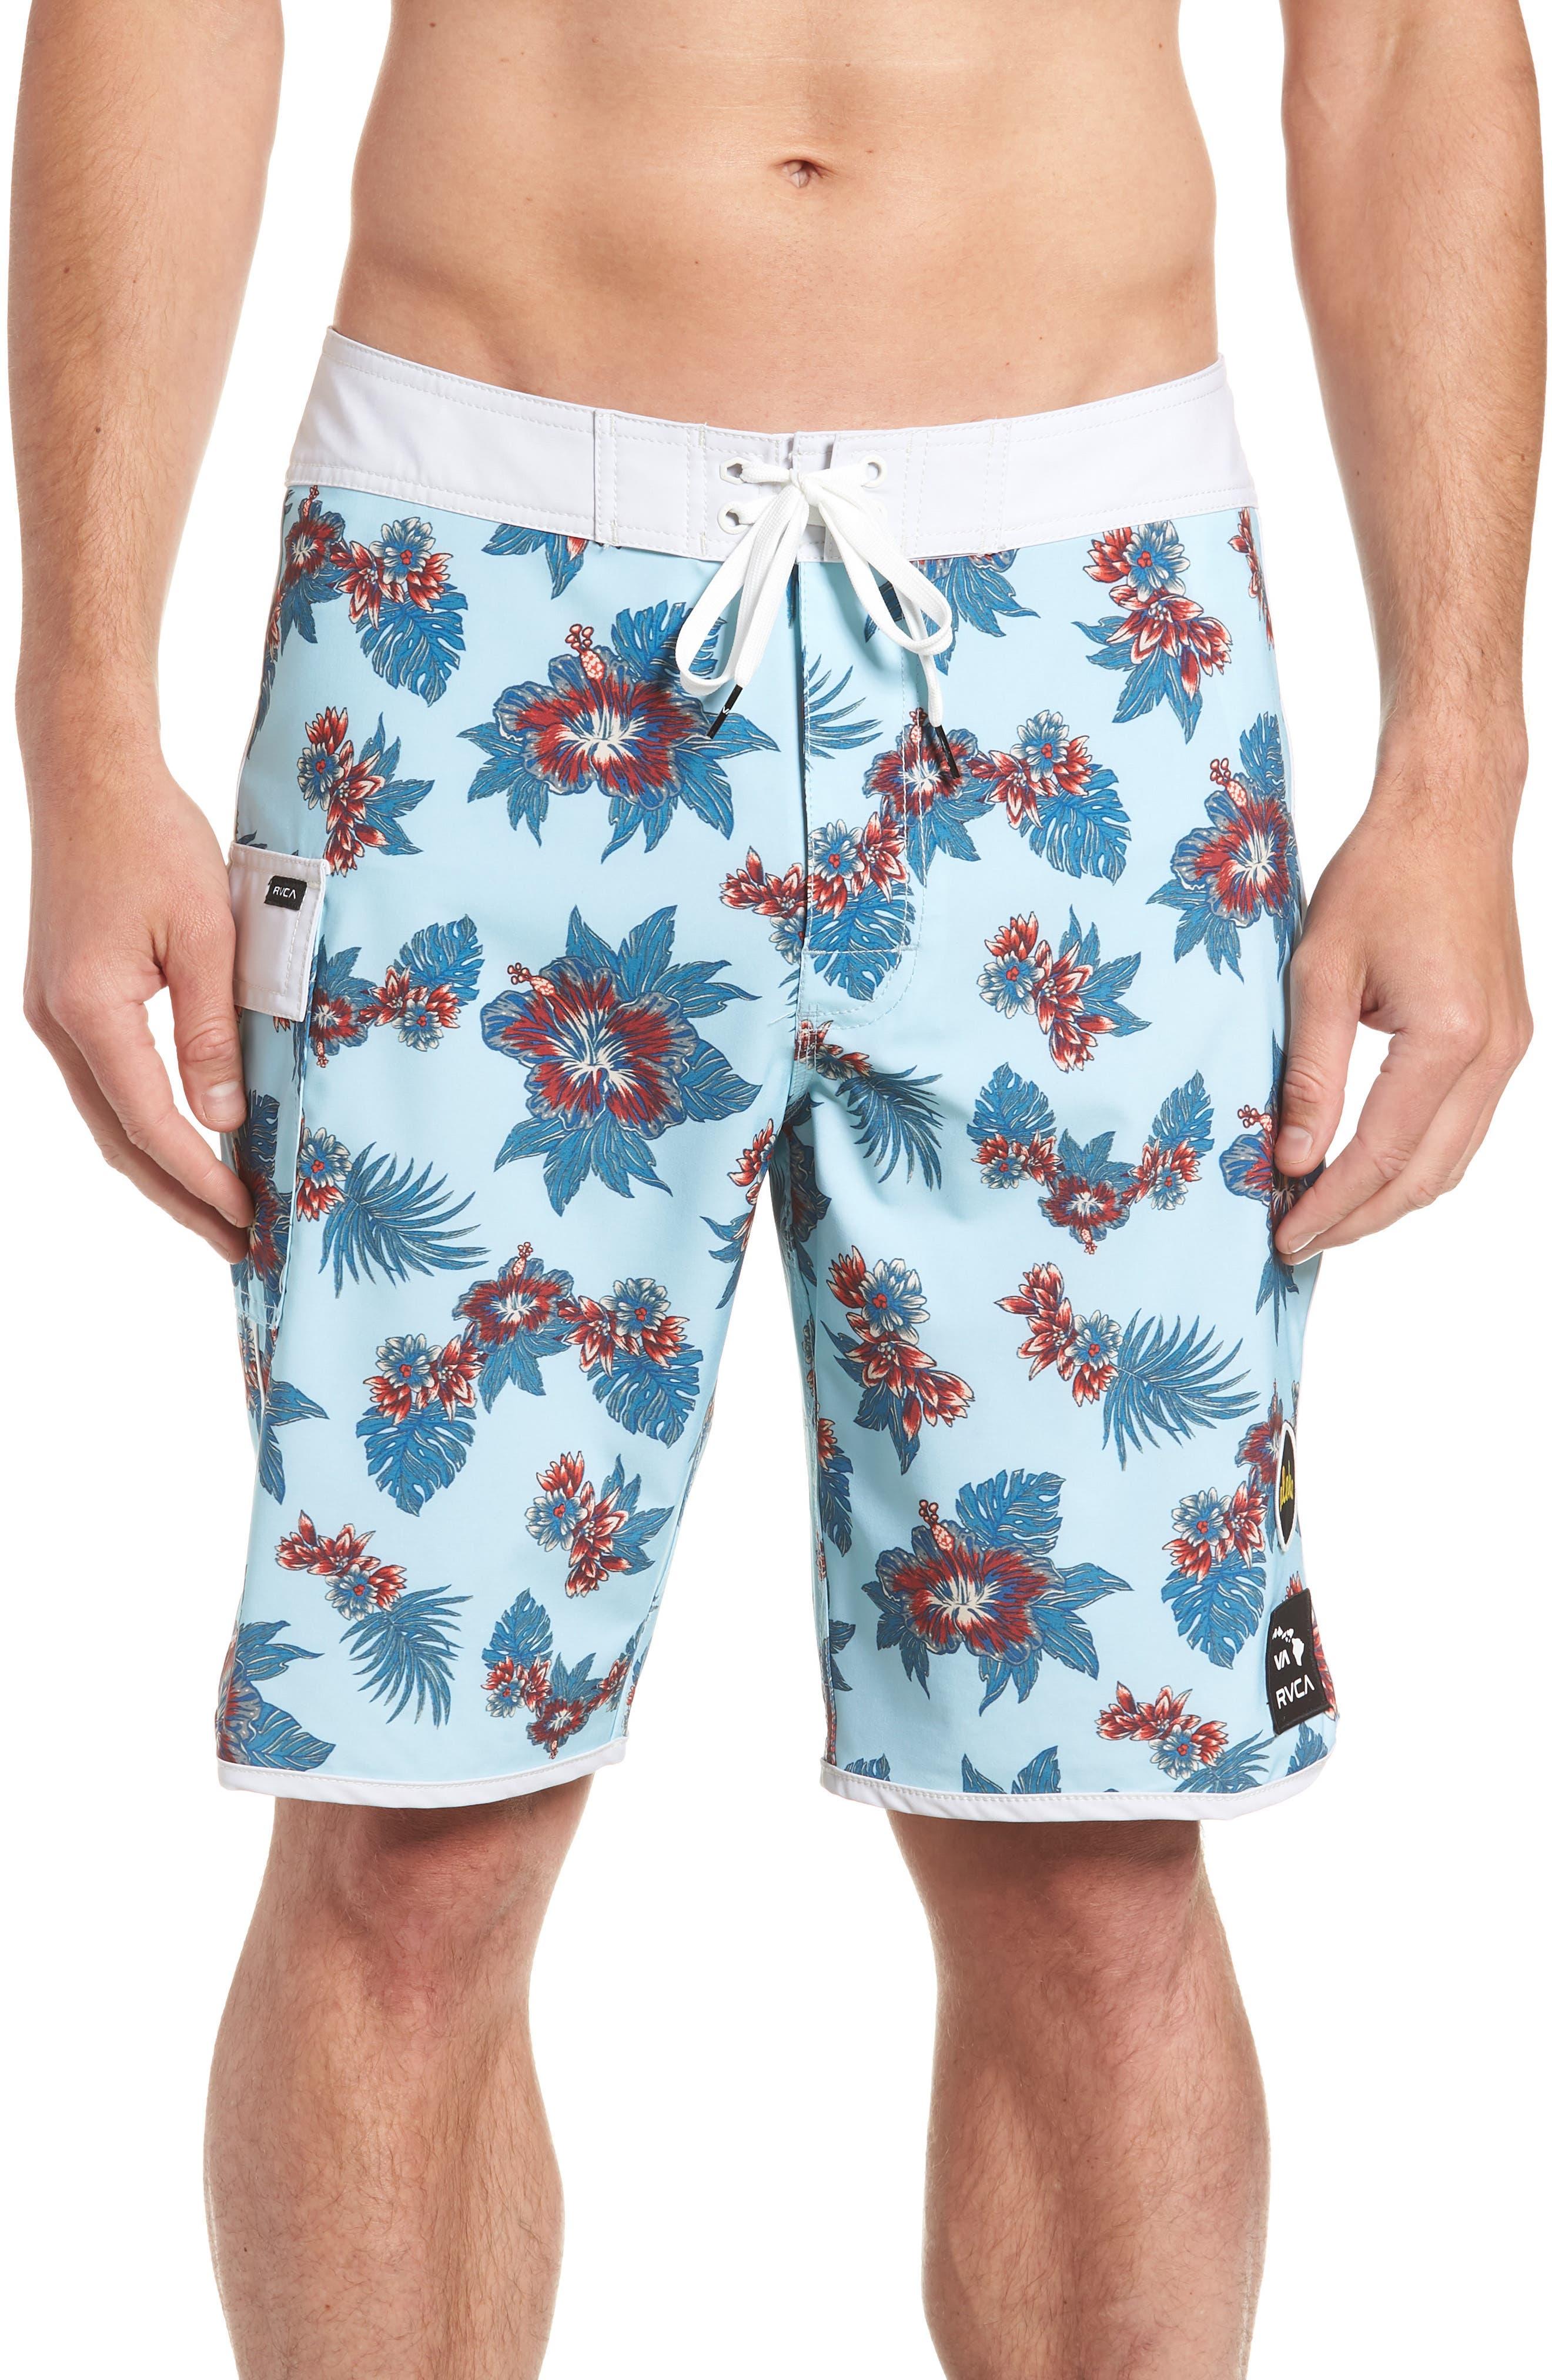 Jeff McMillan Floral Swim Trunks,                         Main,                         color, BLUE FLORAL